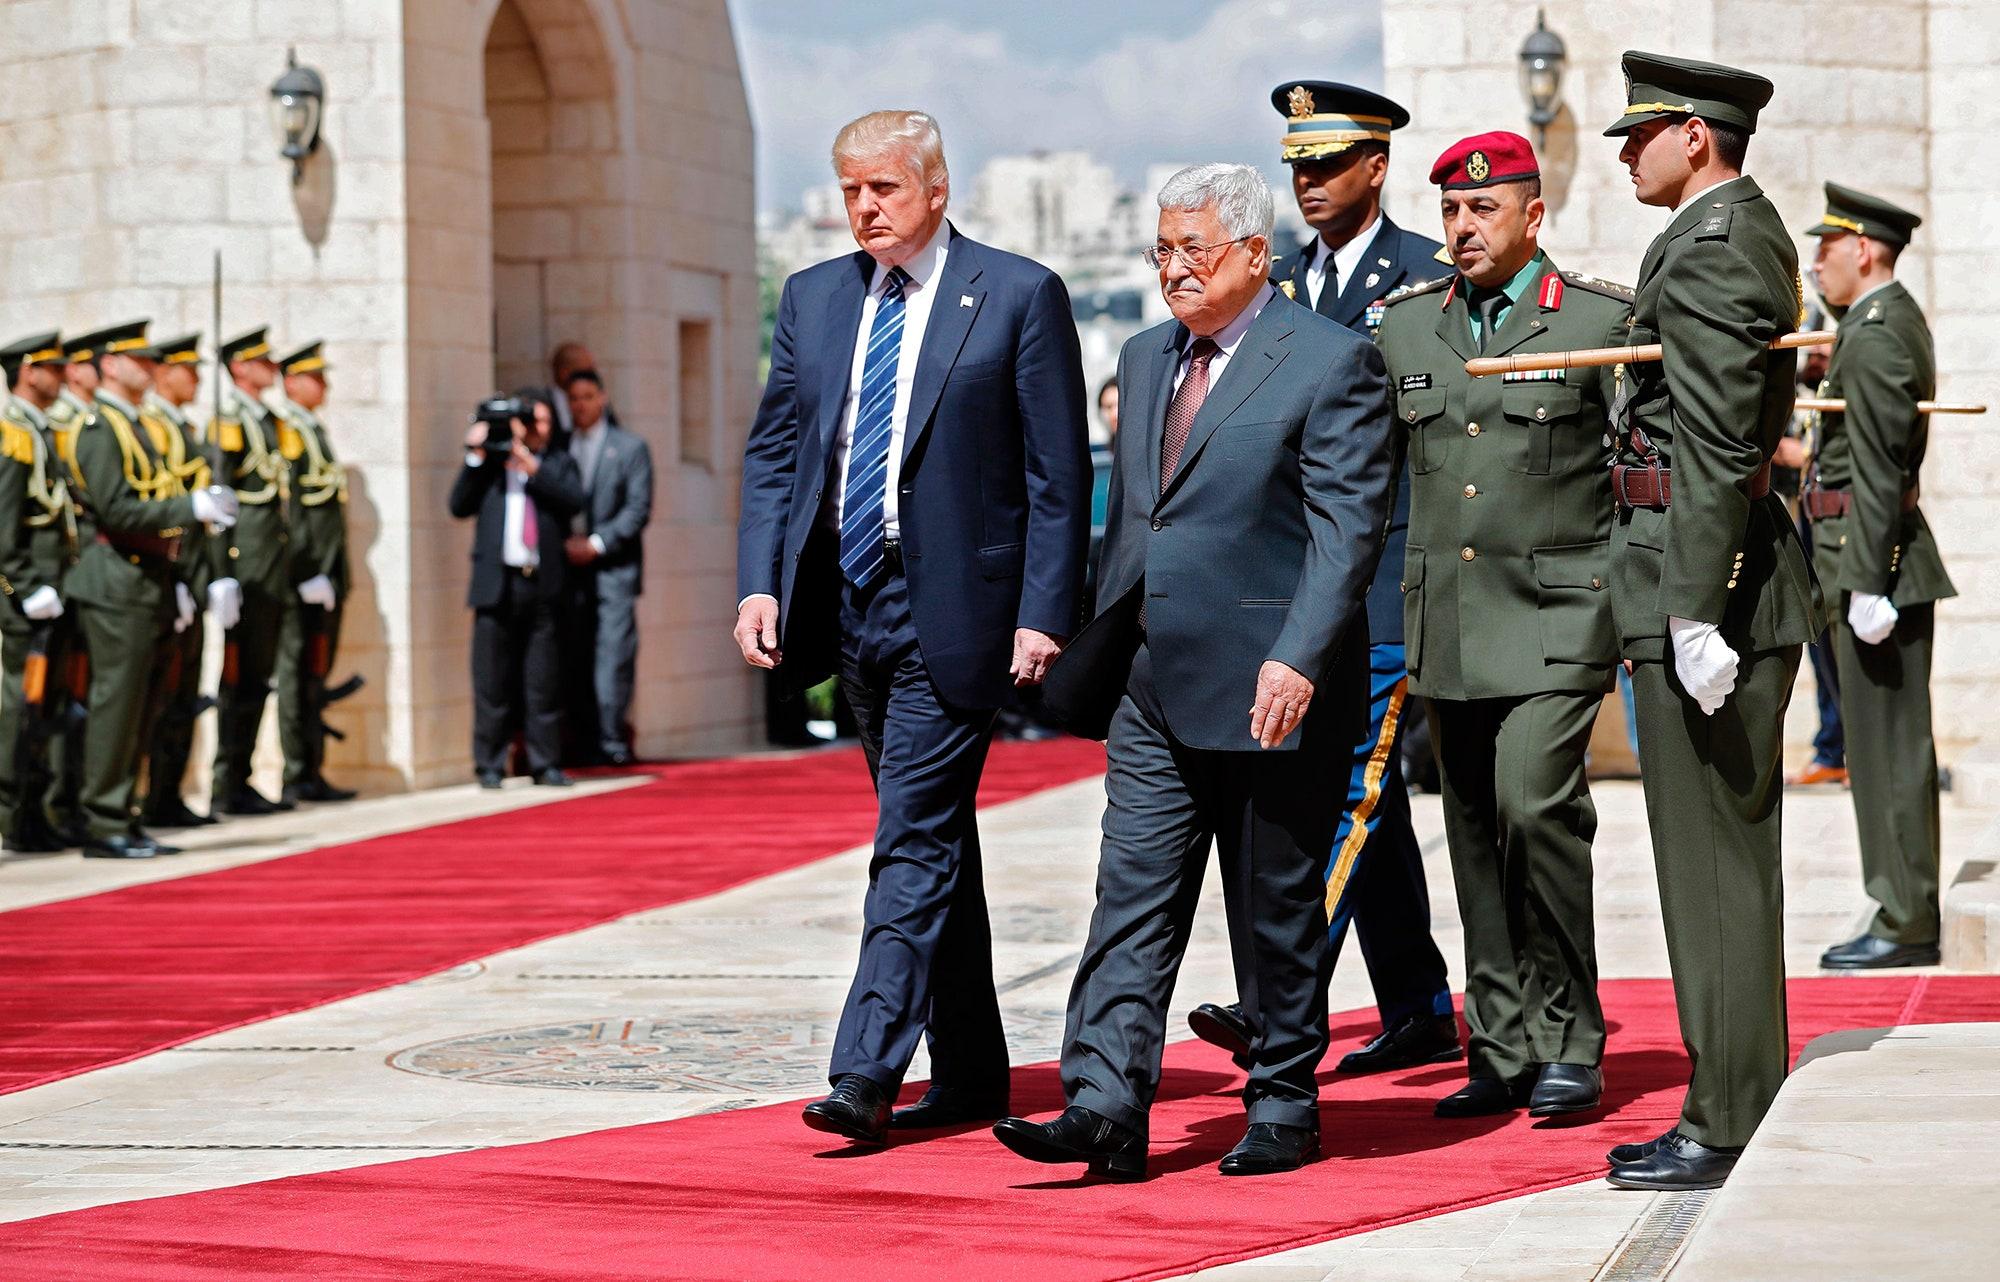 Joe Biden Terpilih, Presiden Palestina Berharap Dapat Bekerja Sama